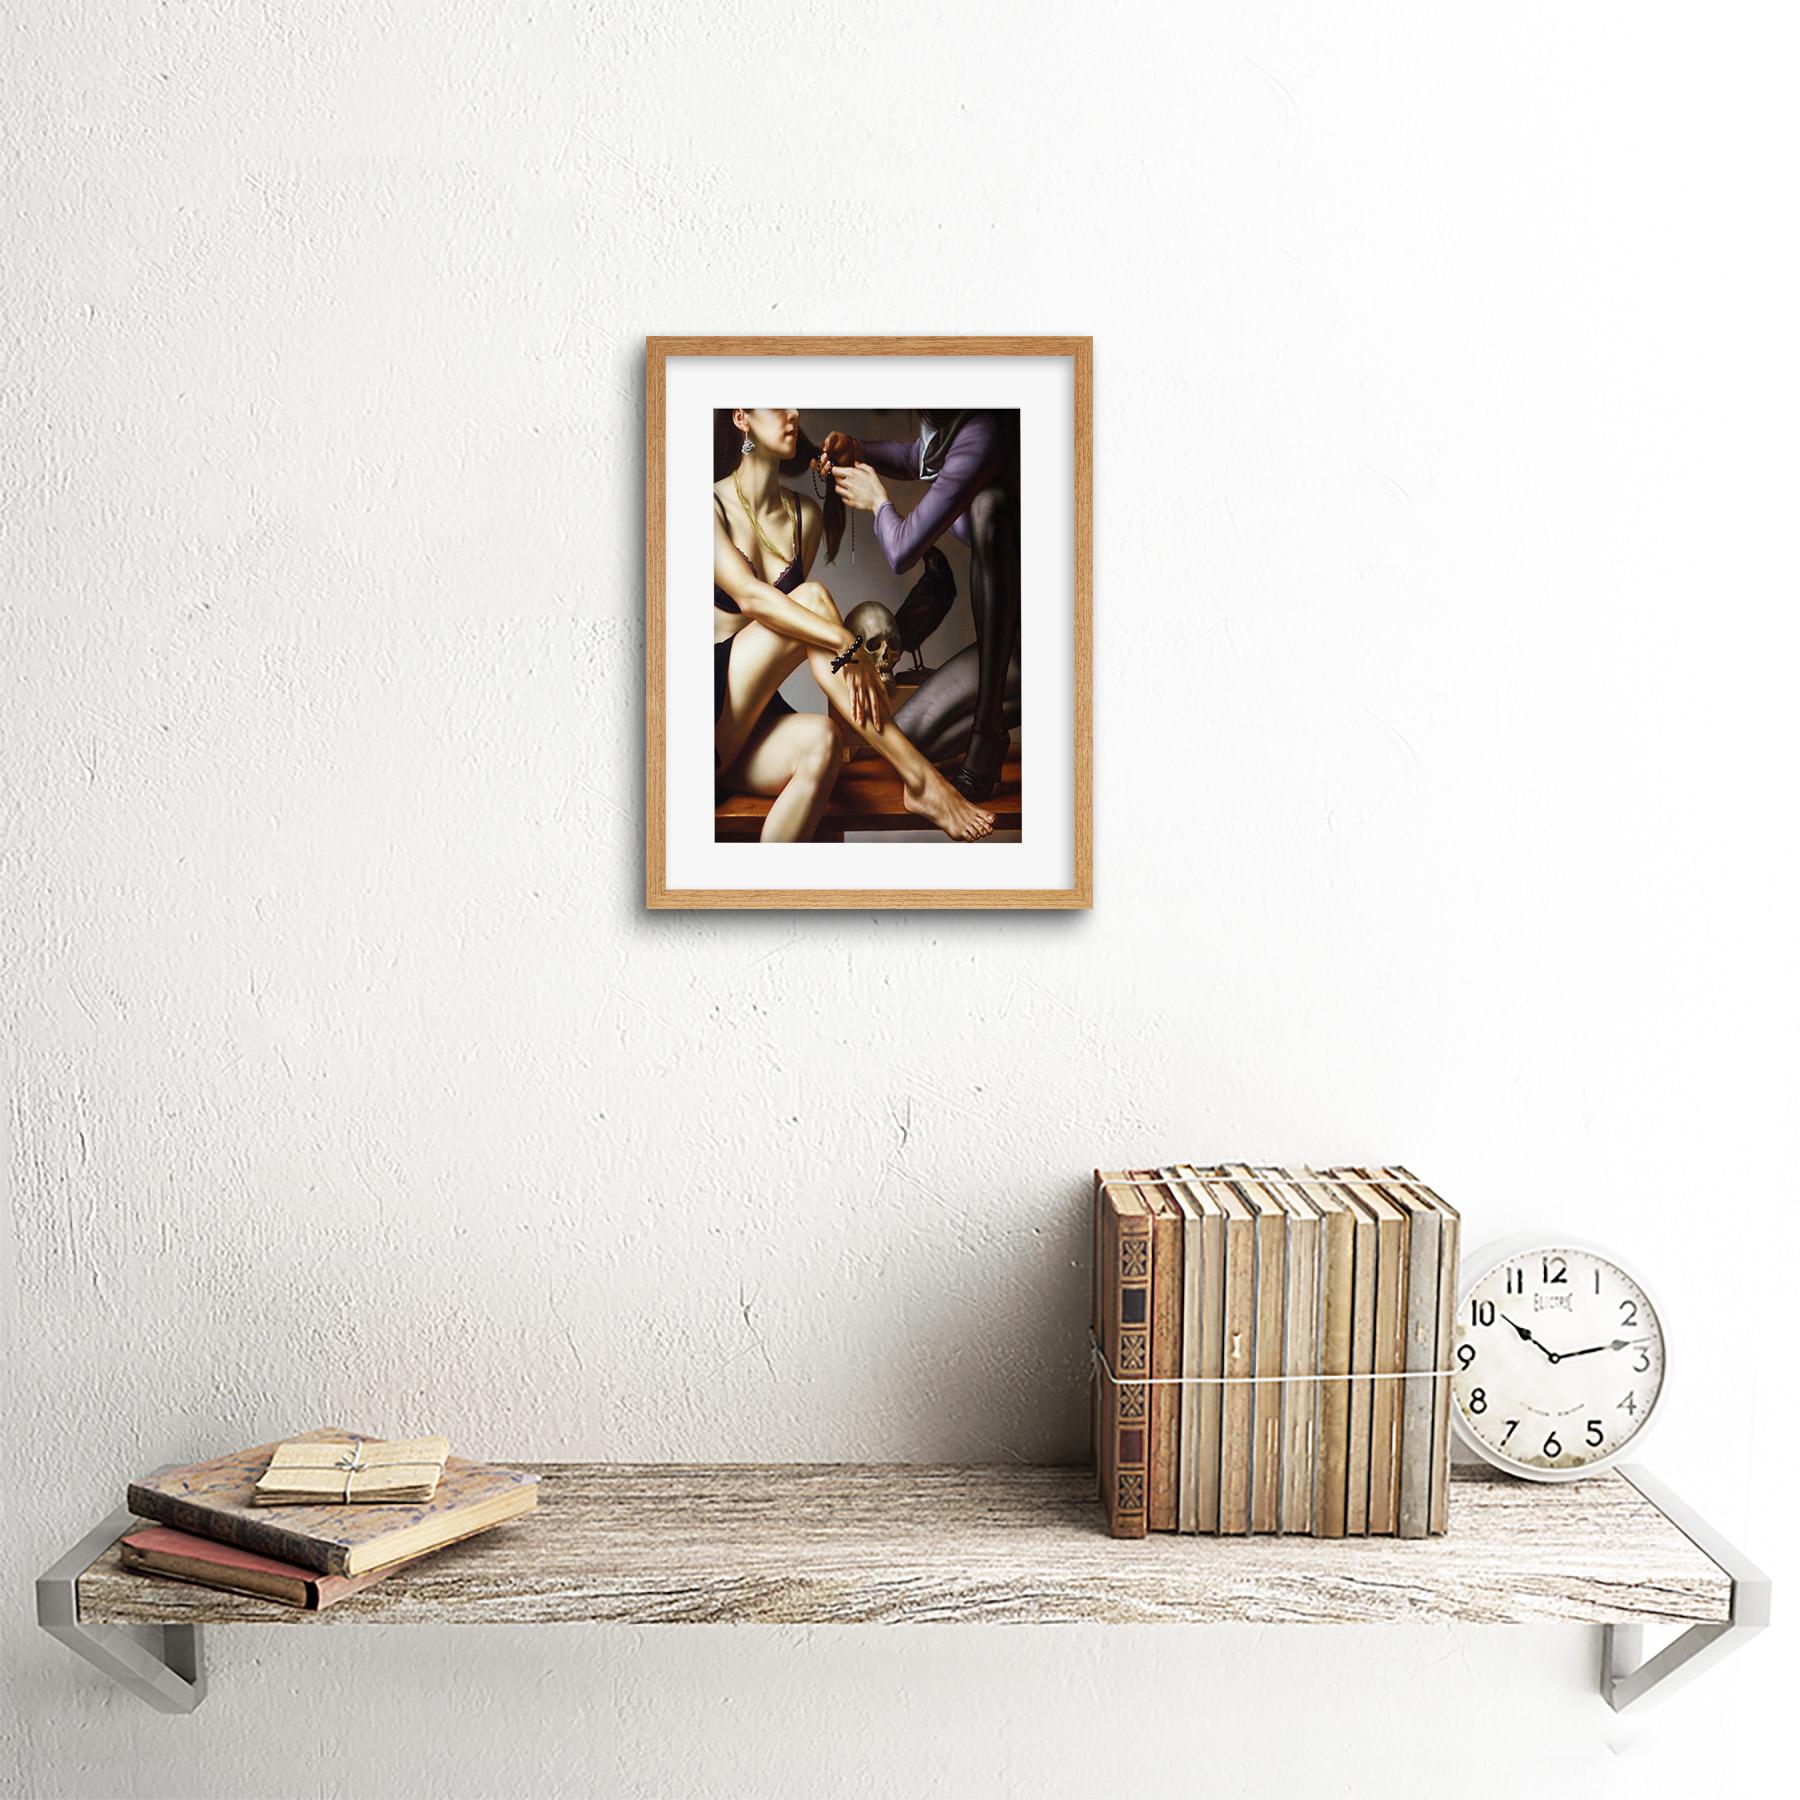 Painting-Balcar-Entering-Renaissance-Framed-Art-Print-9x7-Inch 縮圖 13